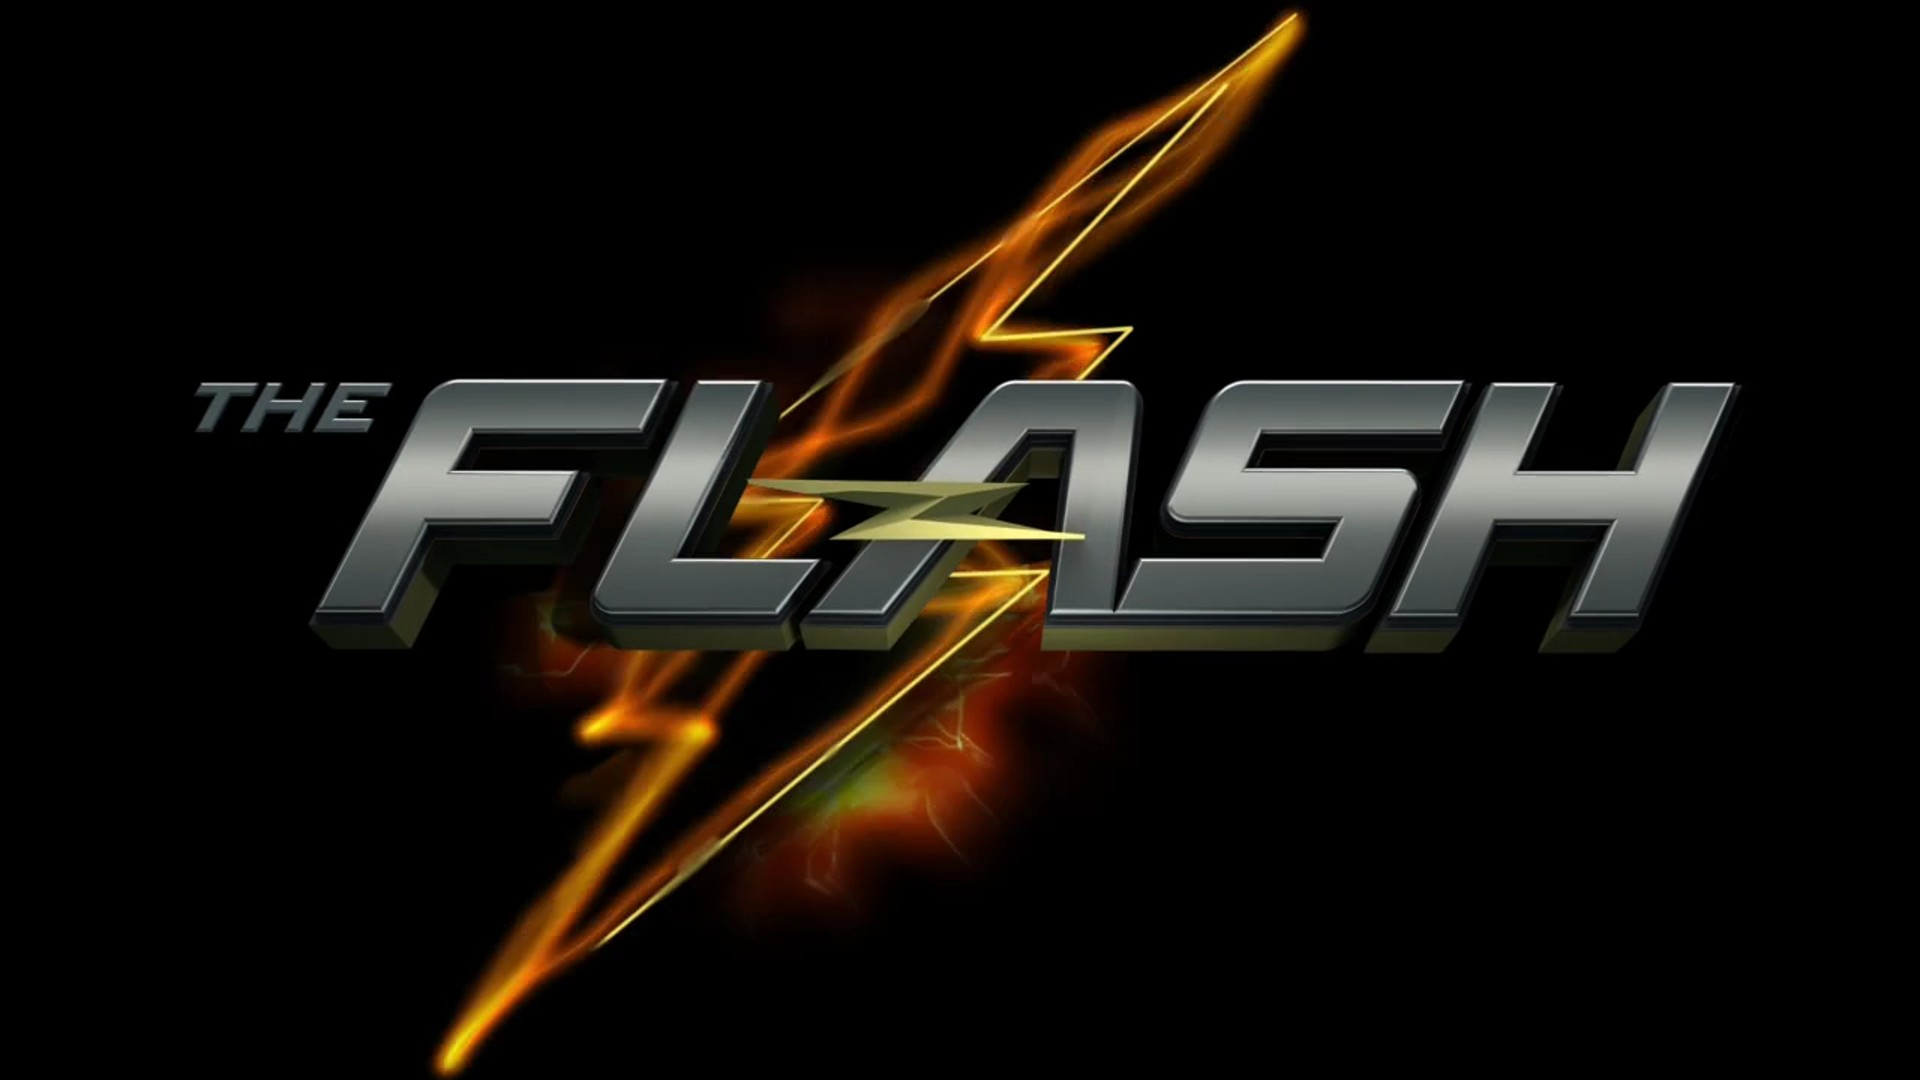 The Flash (2014) title card w/Lightning Bolt background